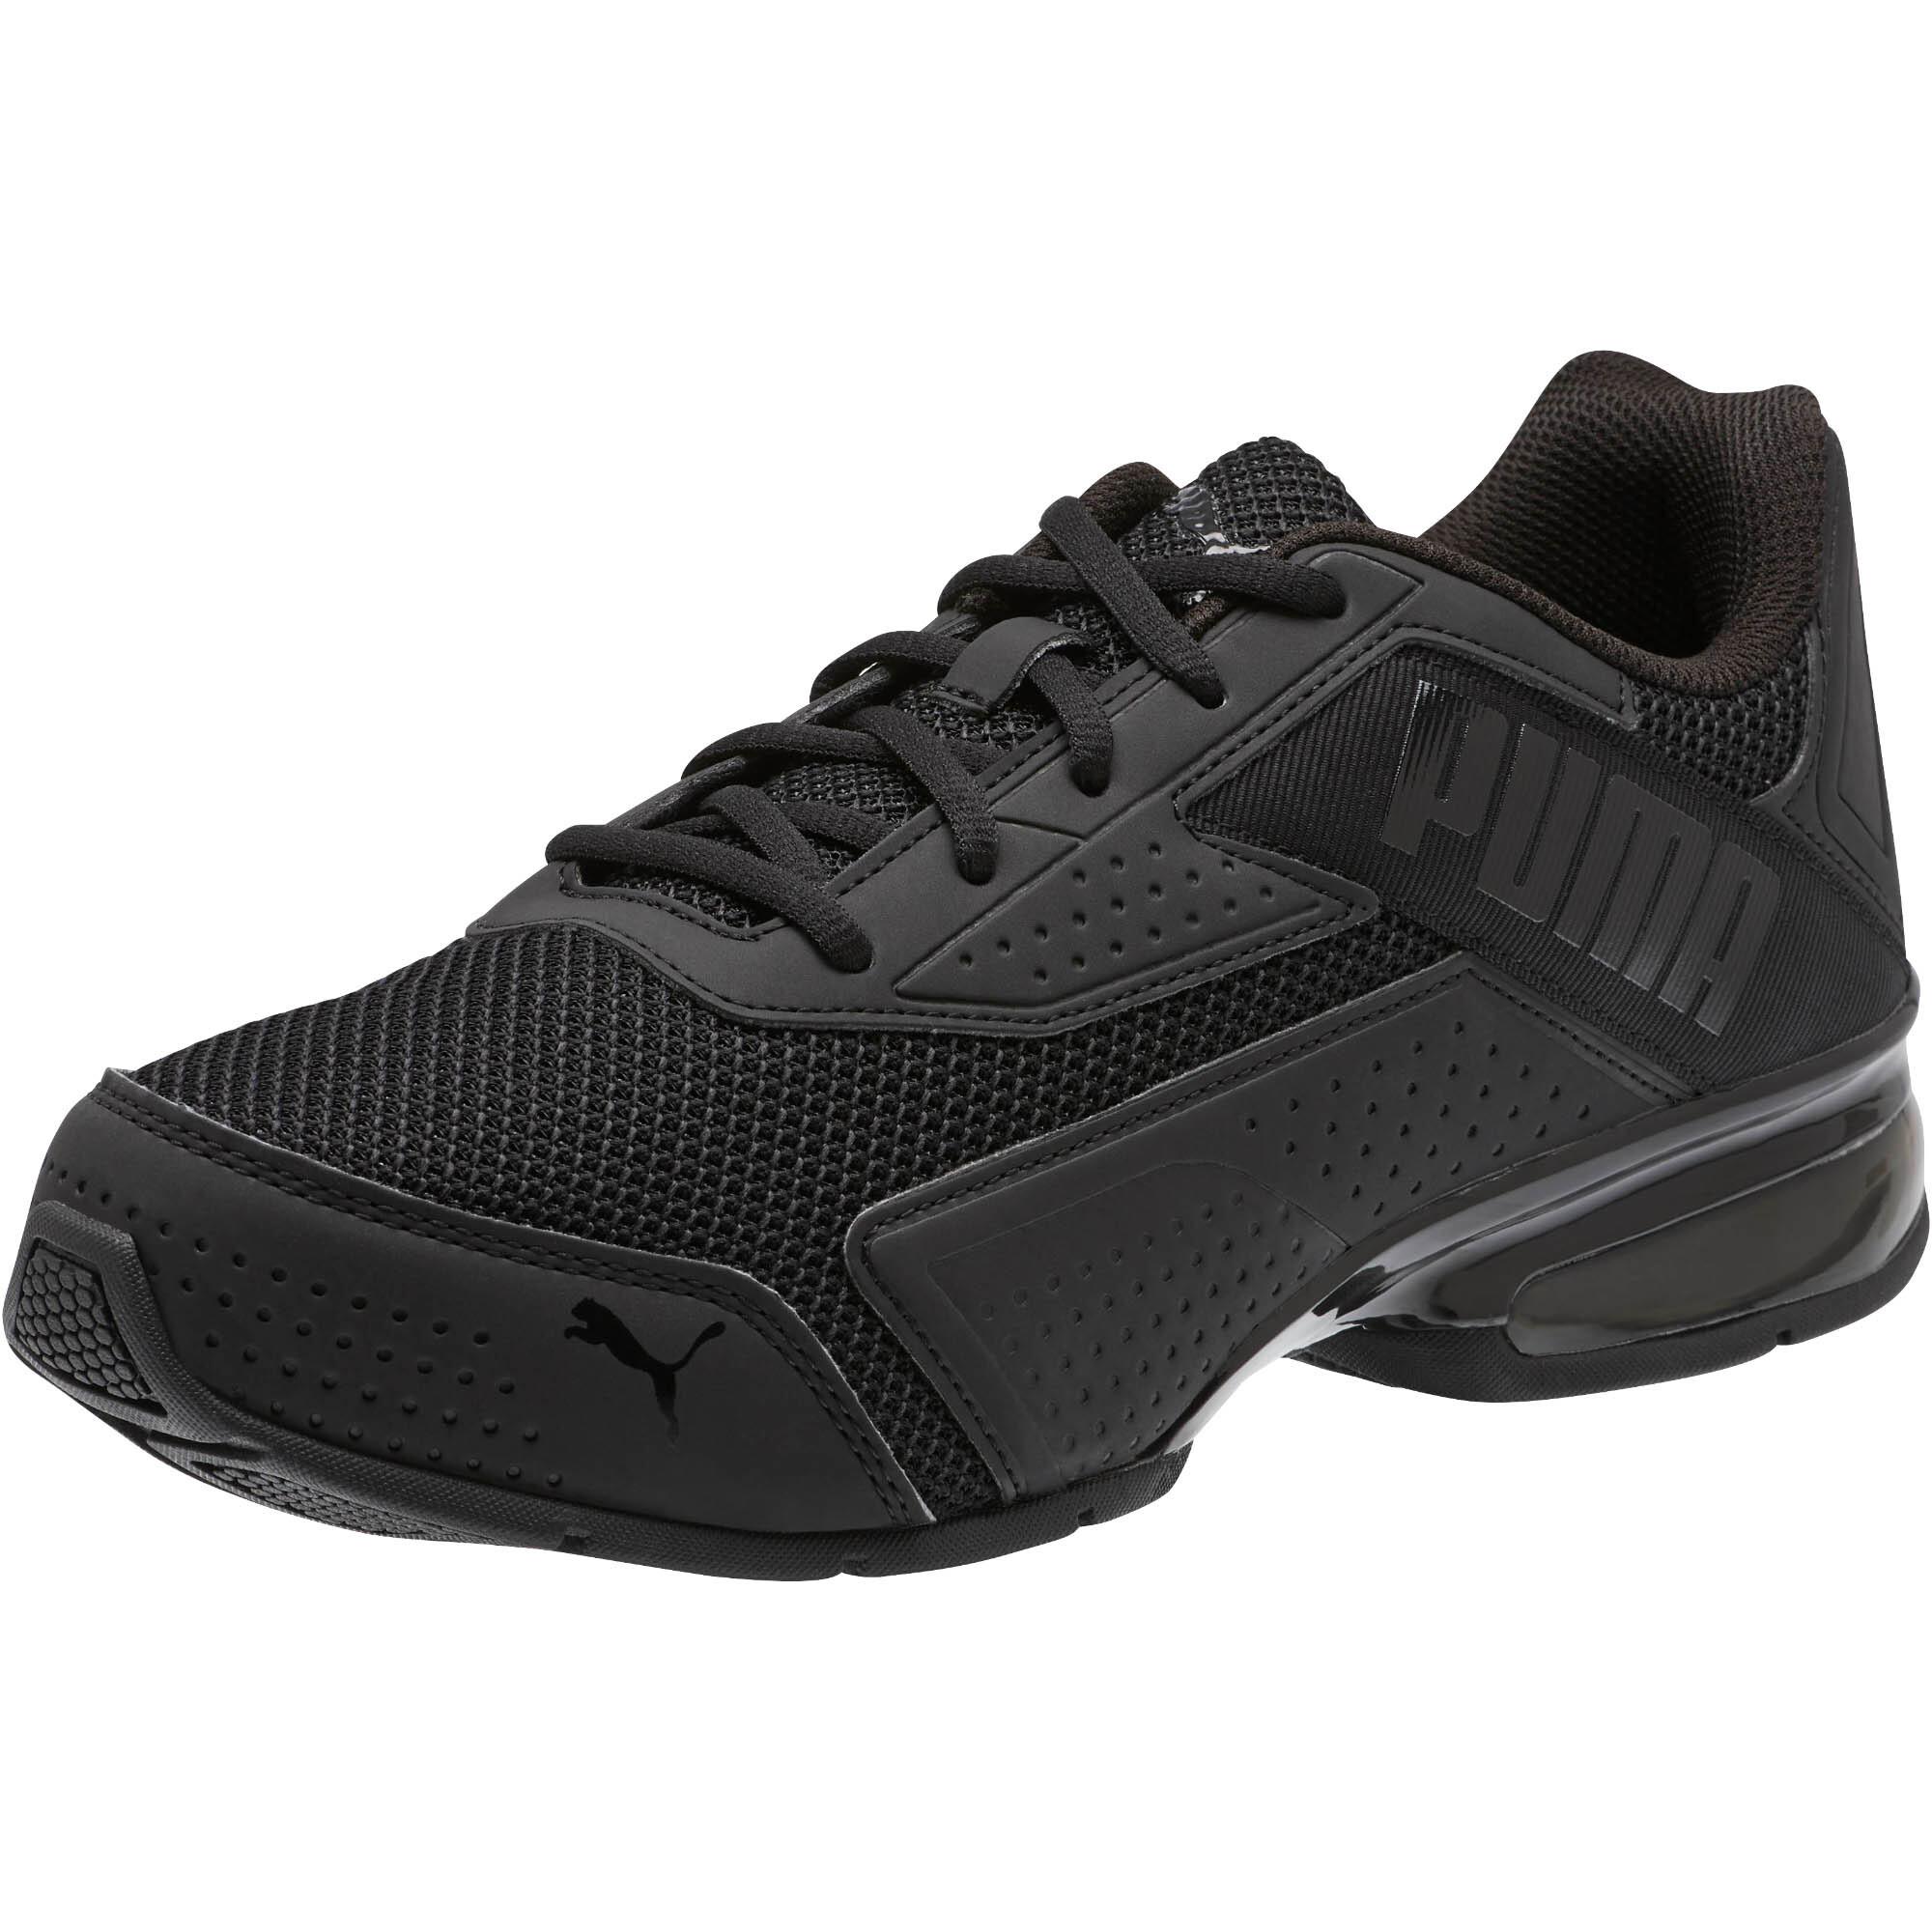 PUMA-Leader-VT-Bold-Men-039-s-Training-Shoes-Men-Shoe-Running thumbnail 9